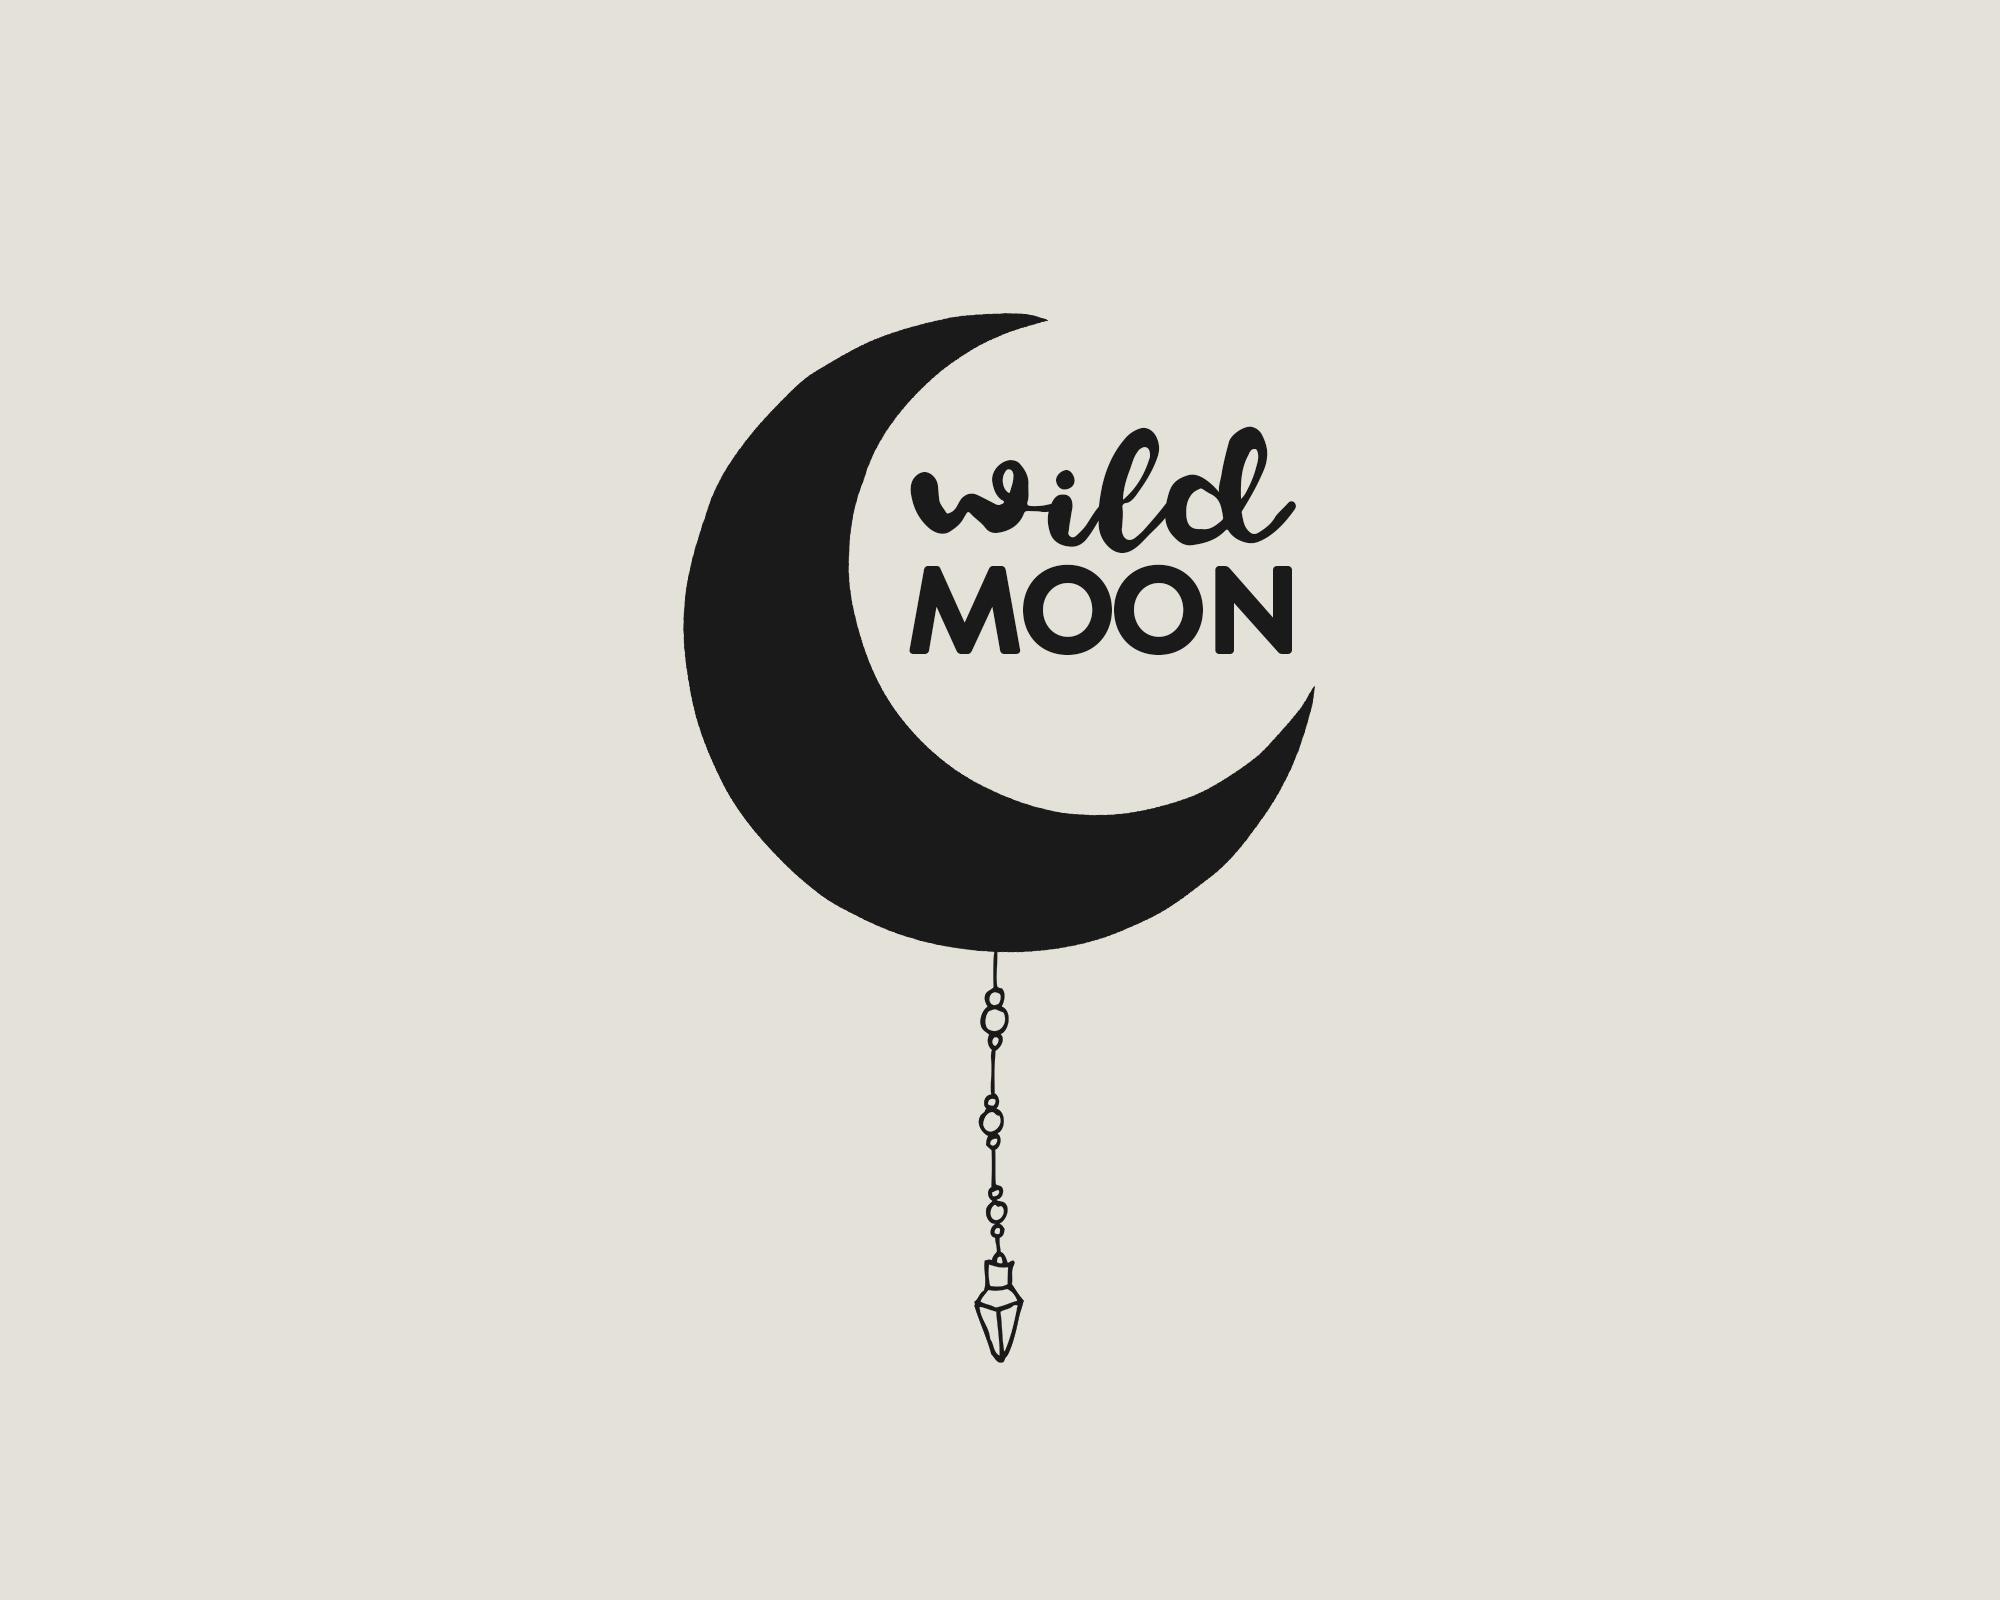 What brand has a moon logo?